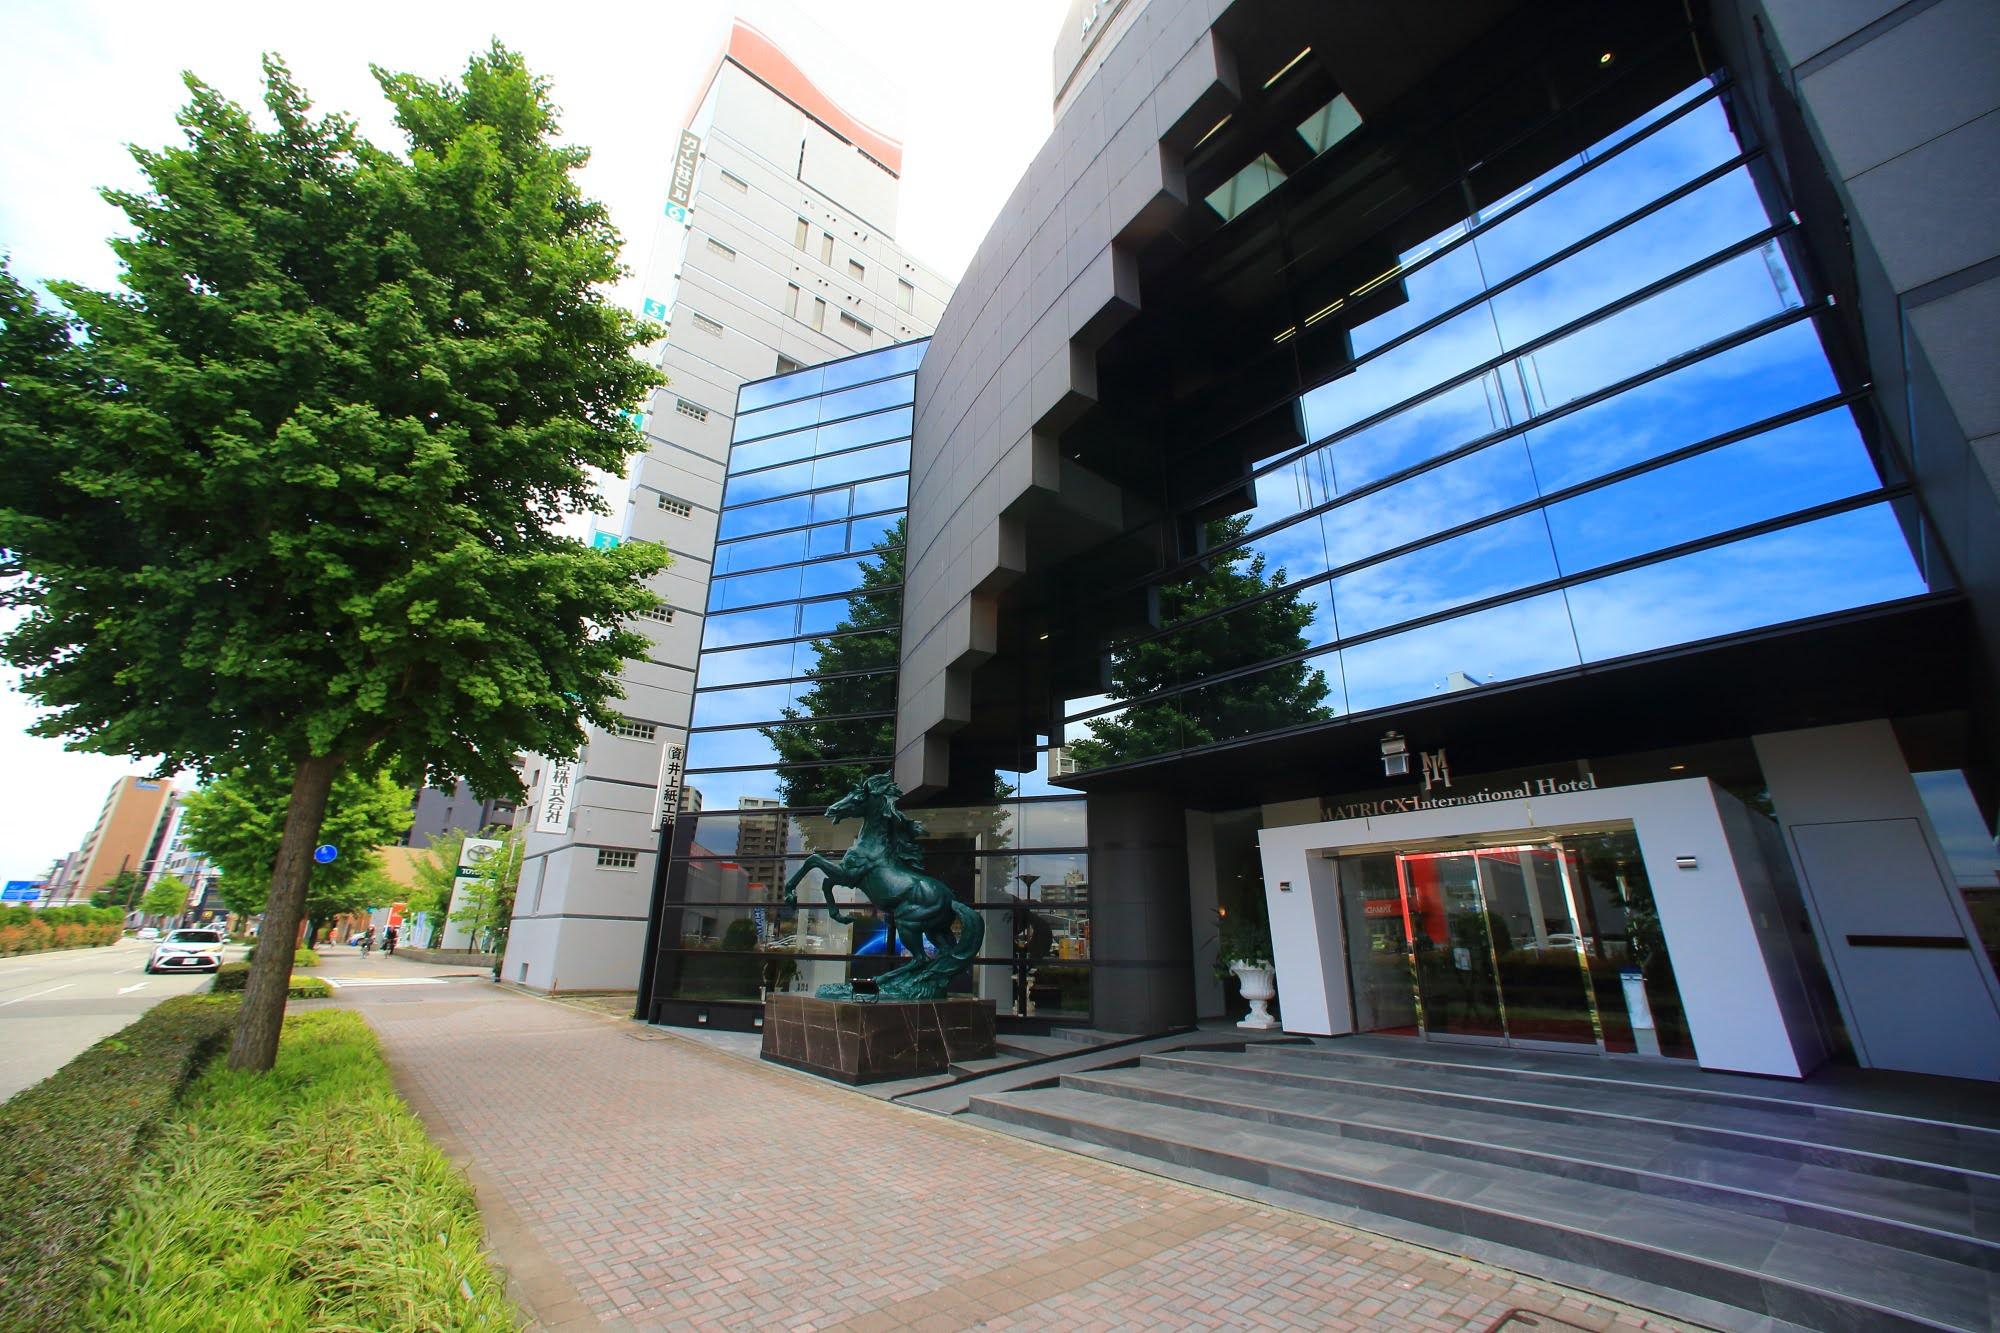 MATRICX INTERNATIONAL HOTEL(マトリックス・インターナショナル・ホテル)